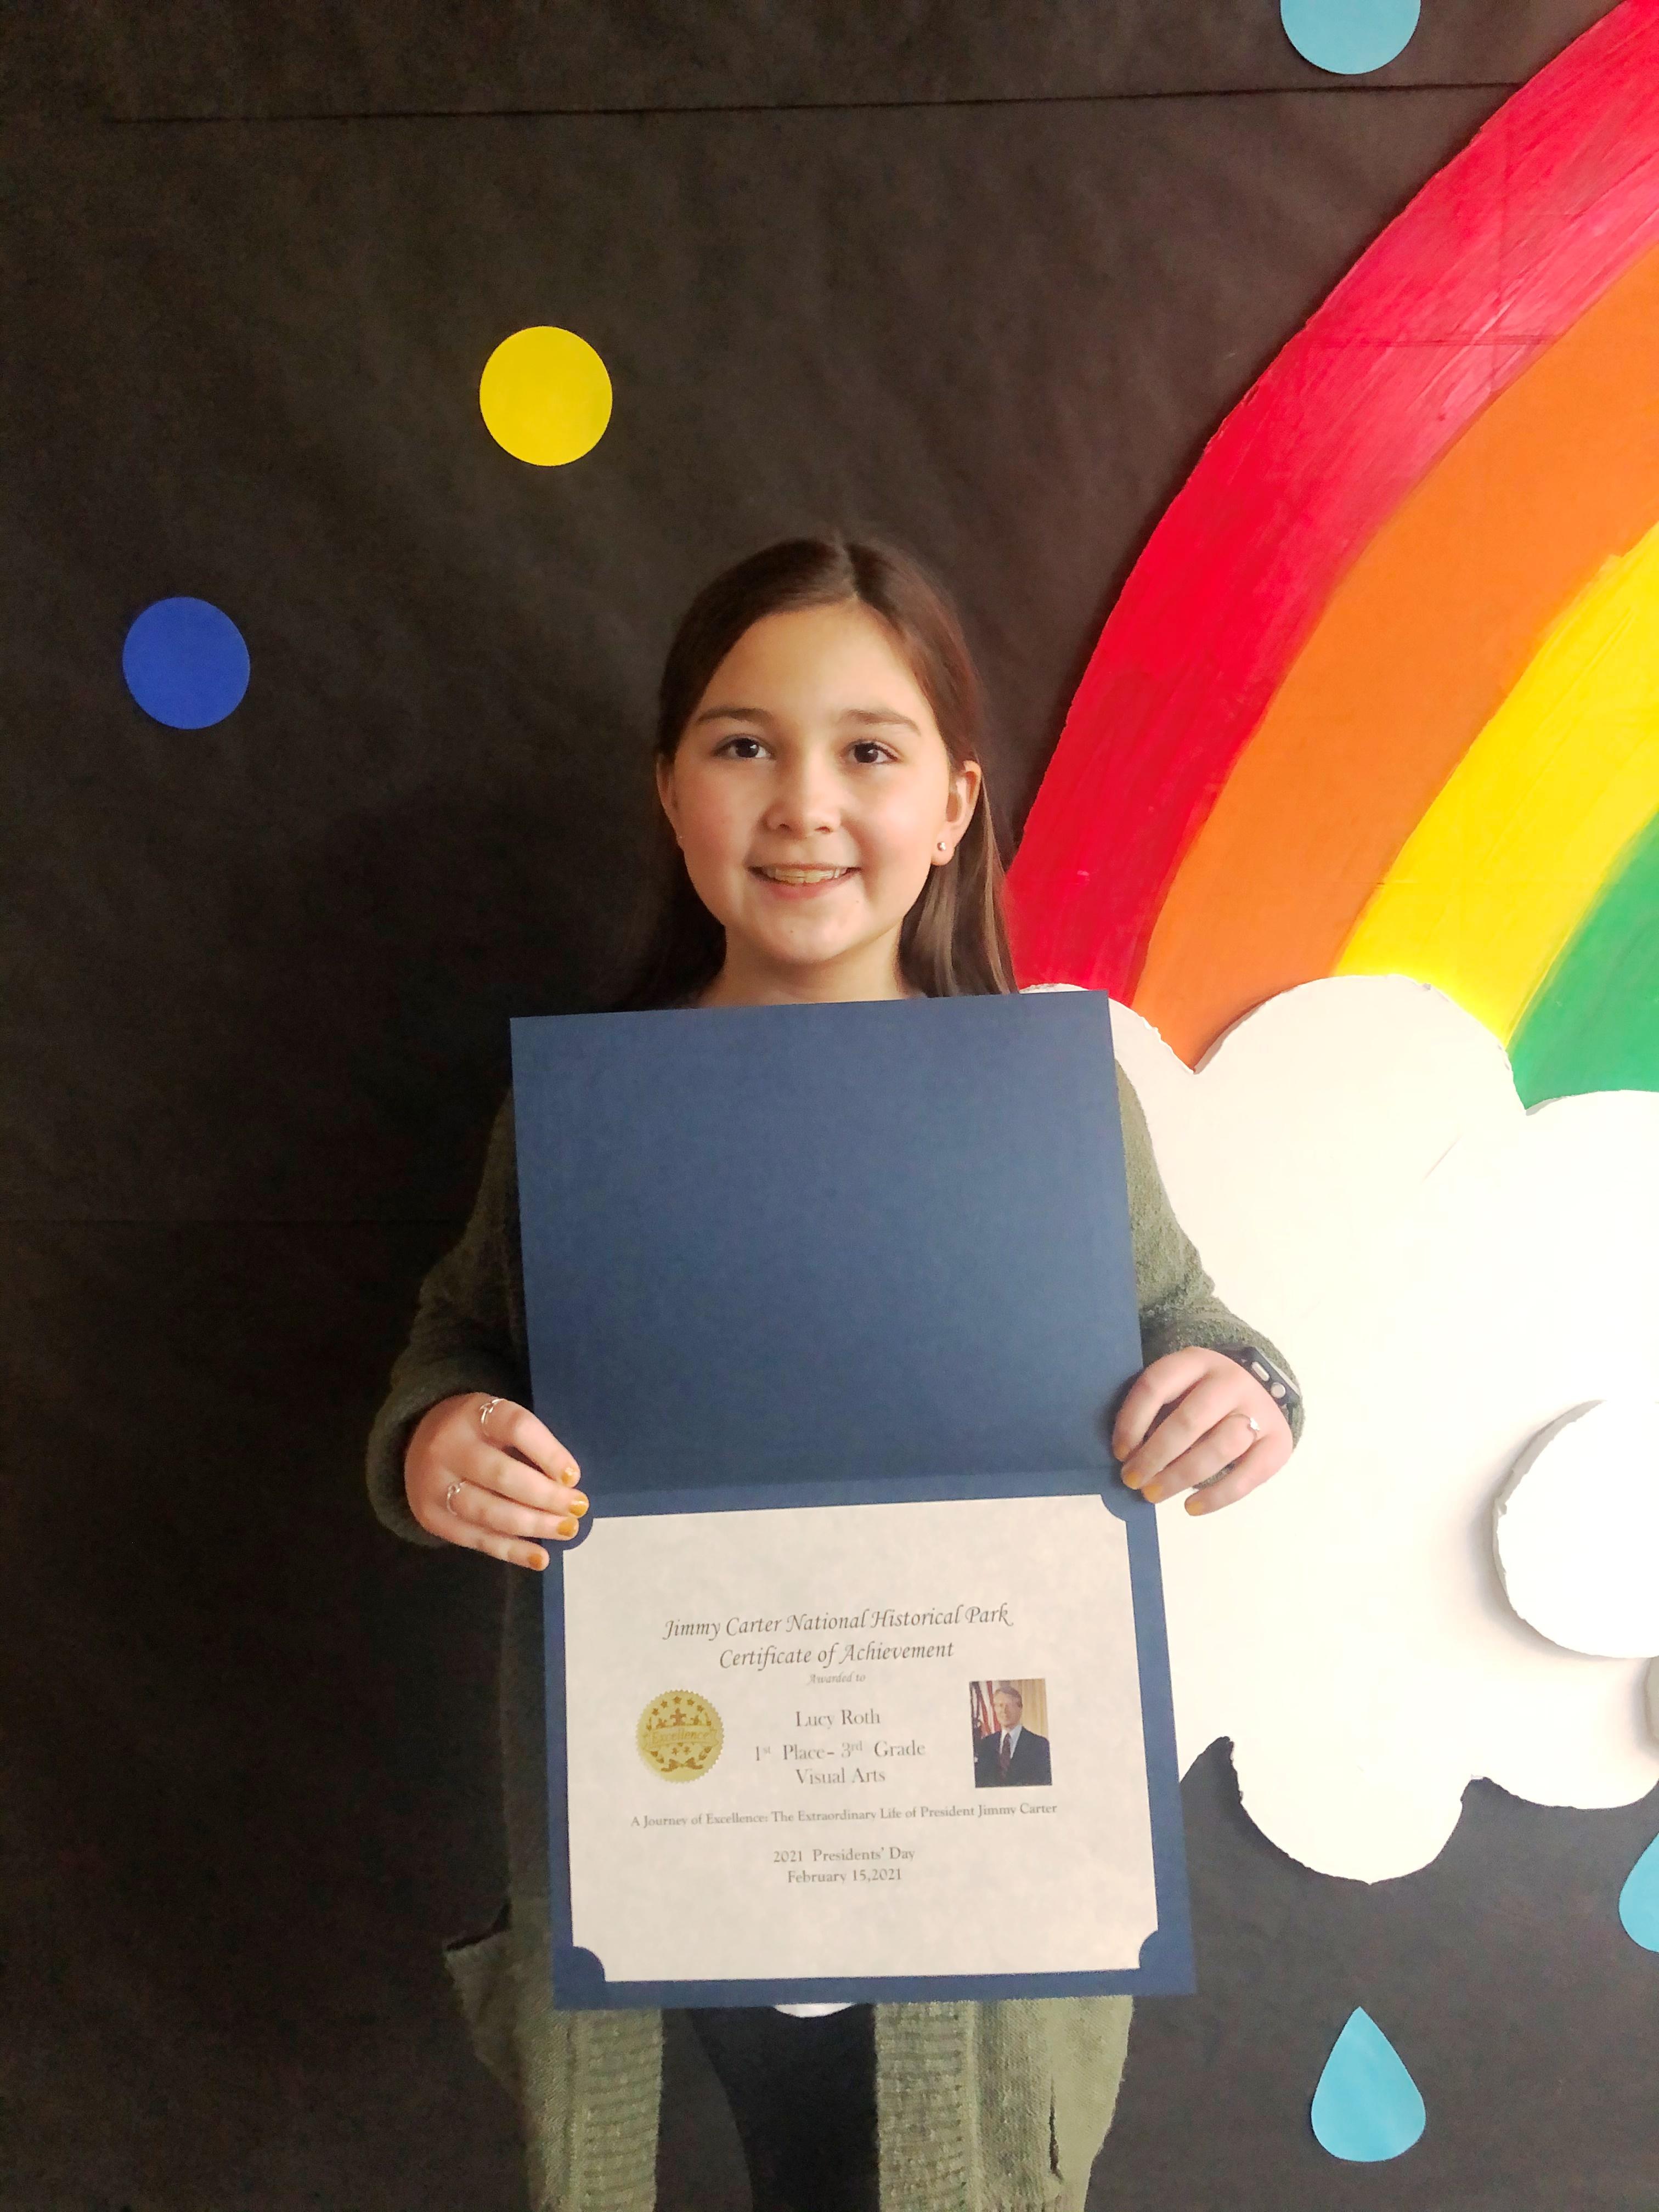 3rd Grader Lucy Roth